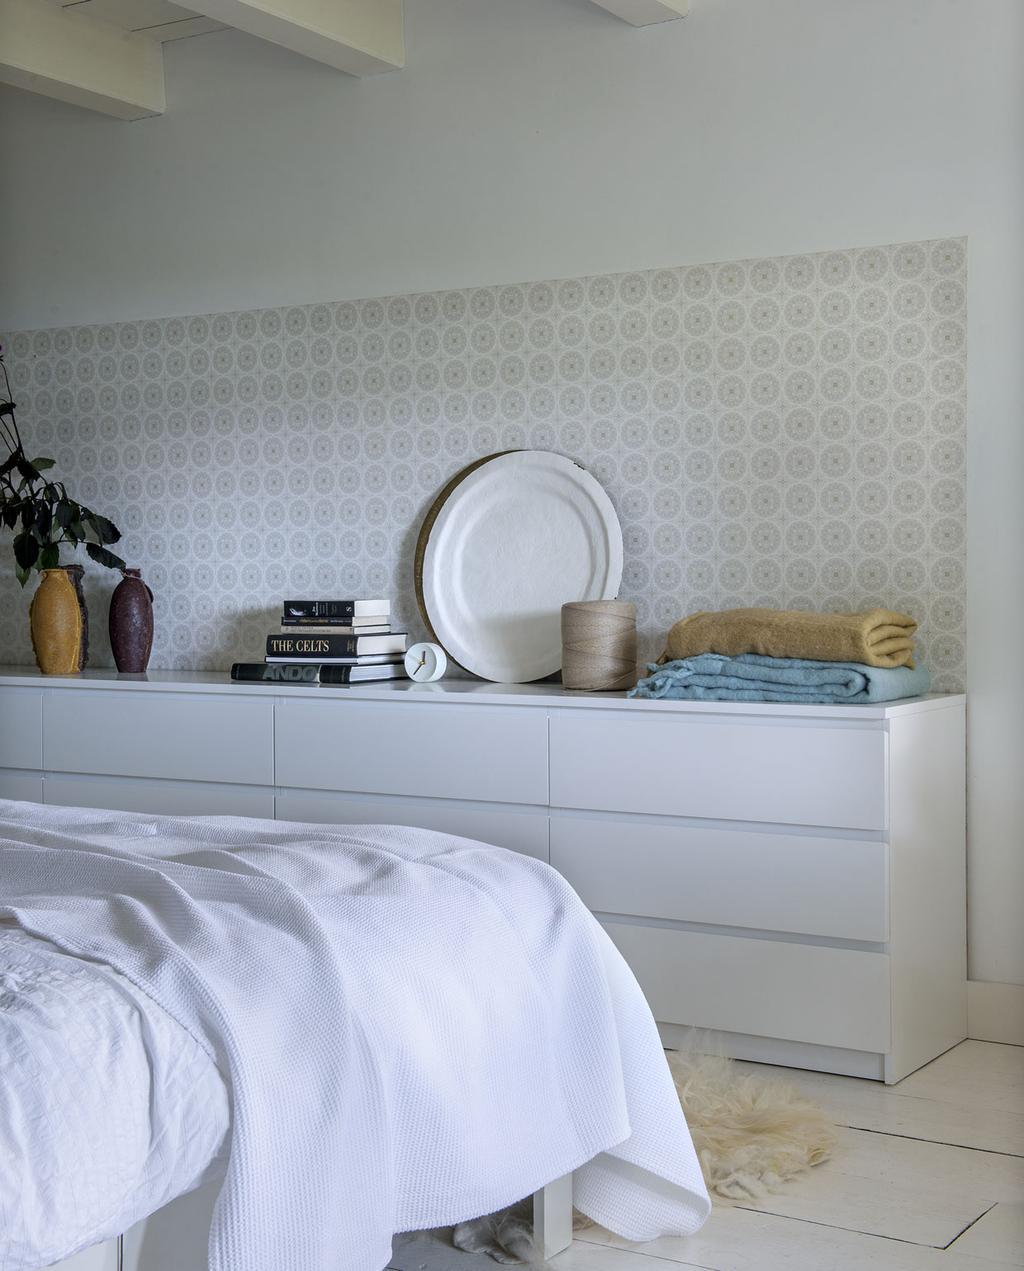 vtwonen 11-2019 | binnenkijker Alblasserwaard boerderij slaapkamer bed en accessoires wand